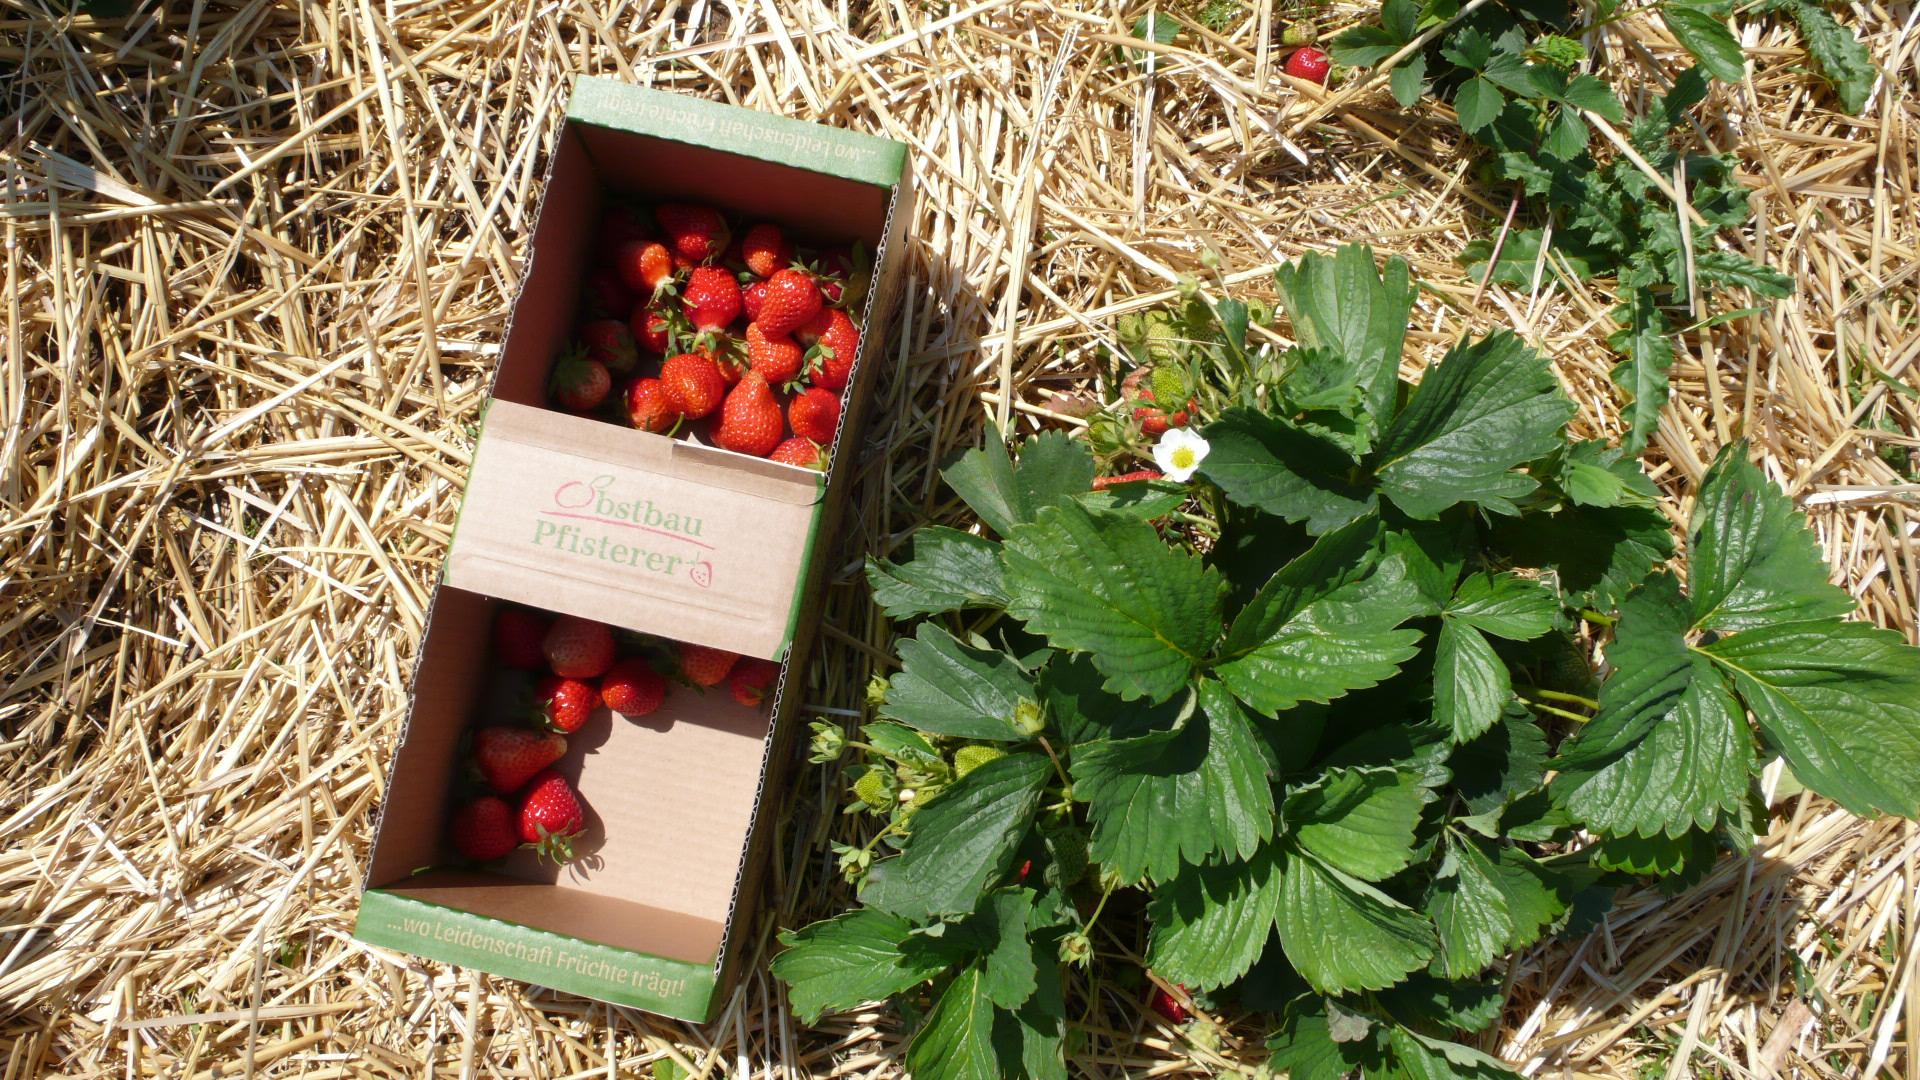 Angebot bei Obstbau Pfisterer